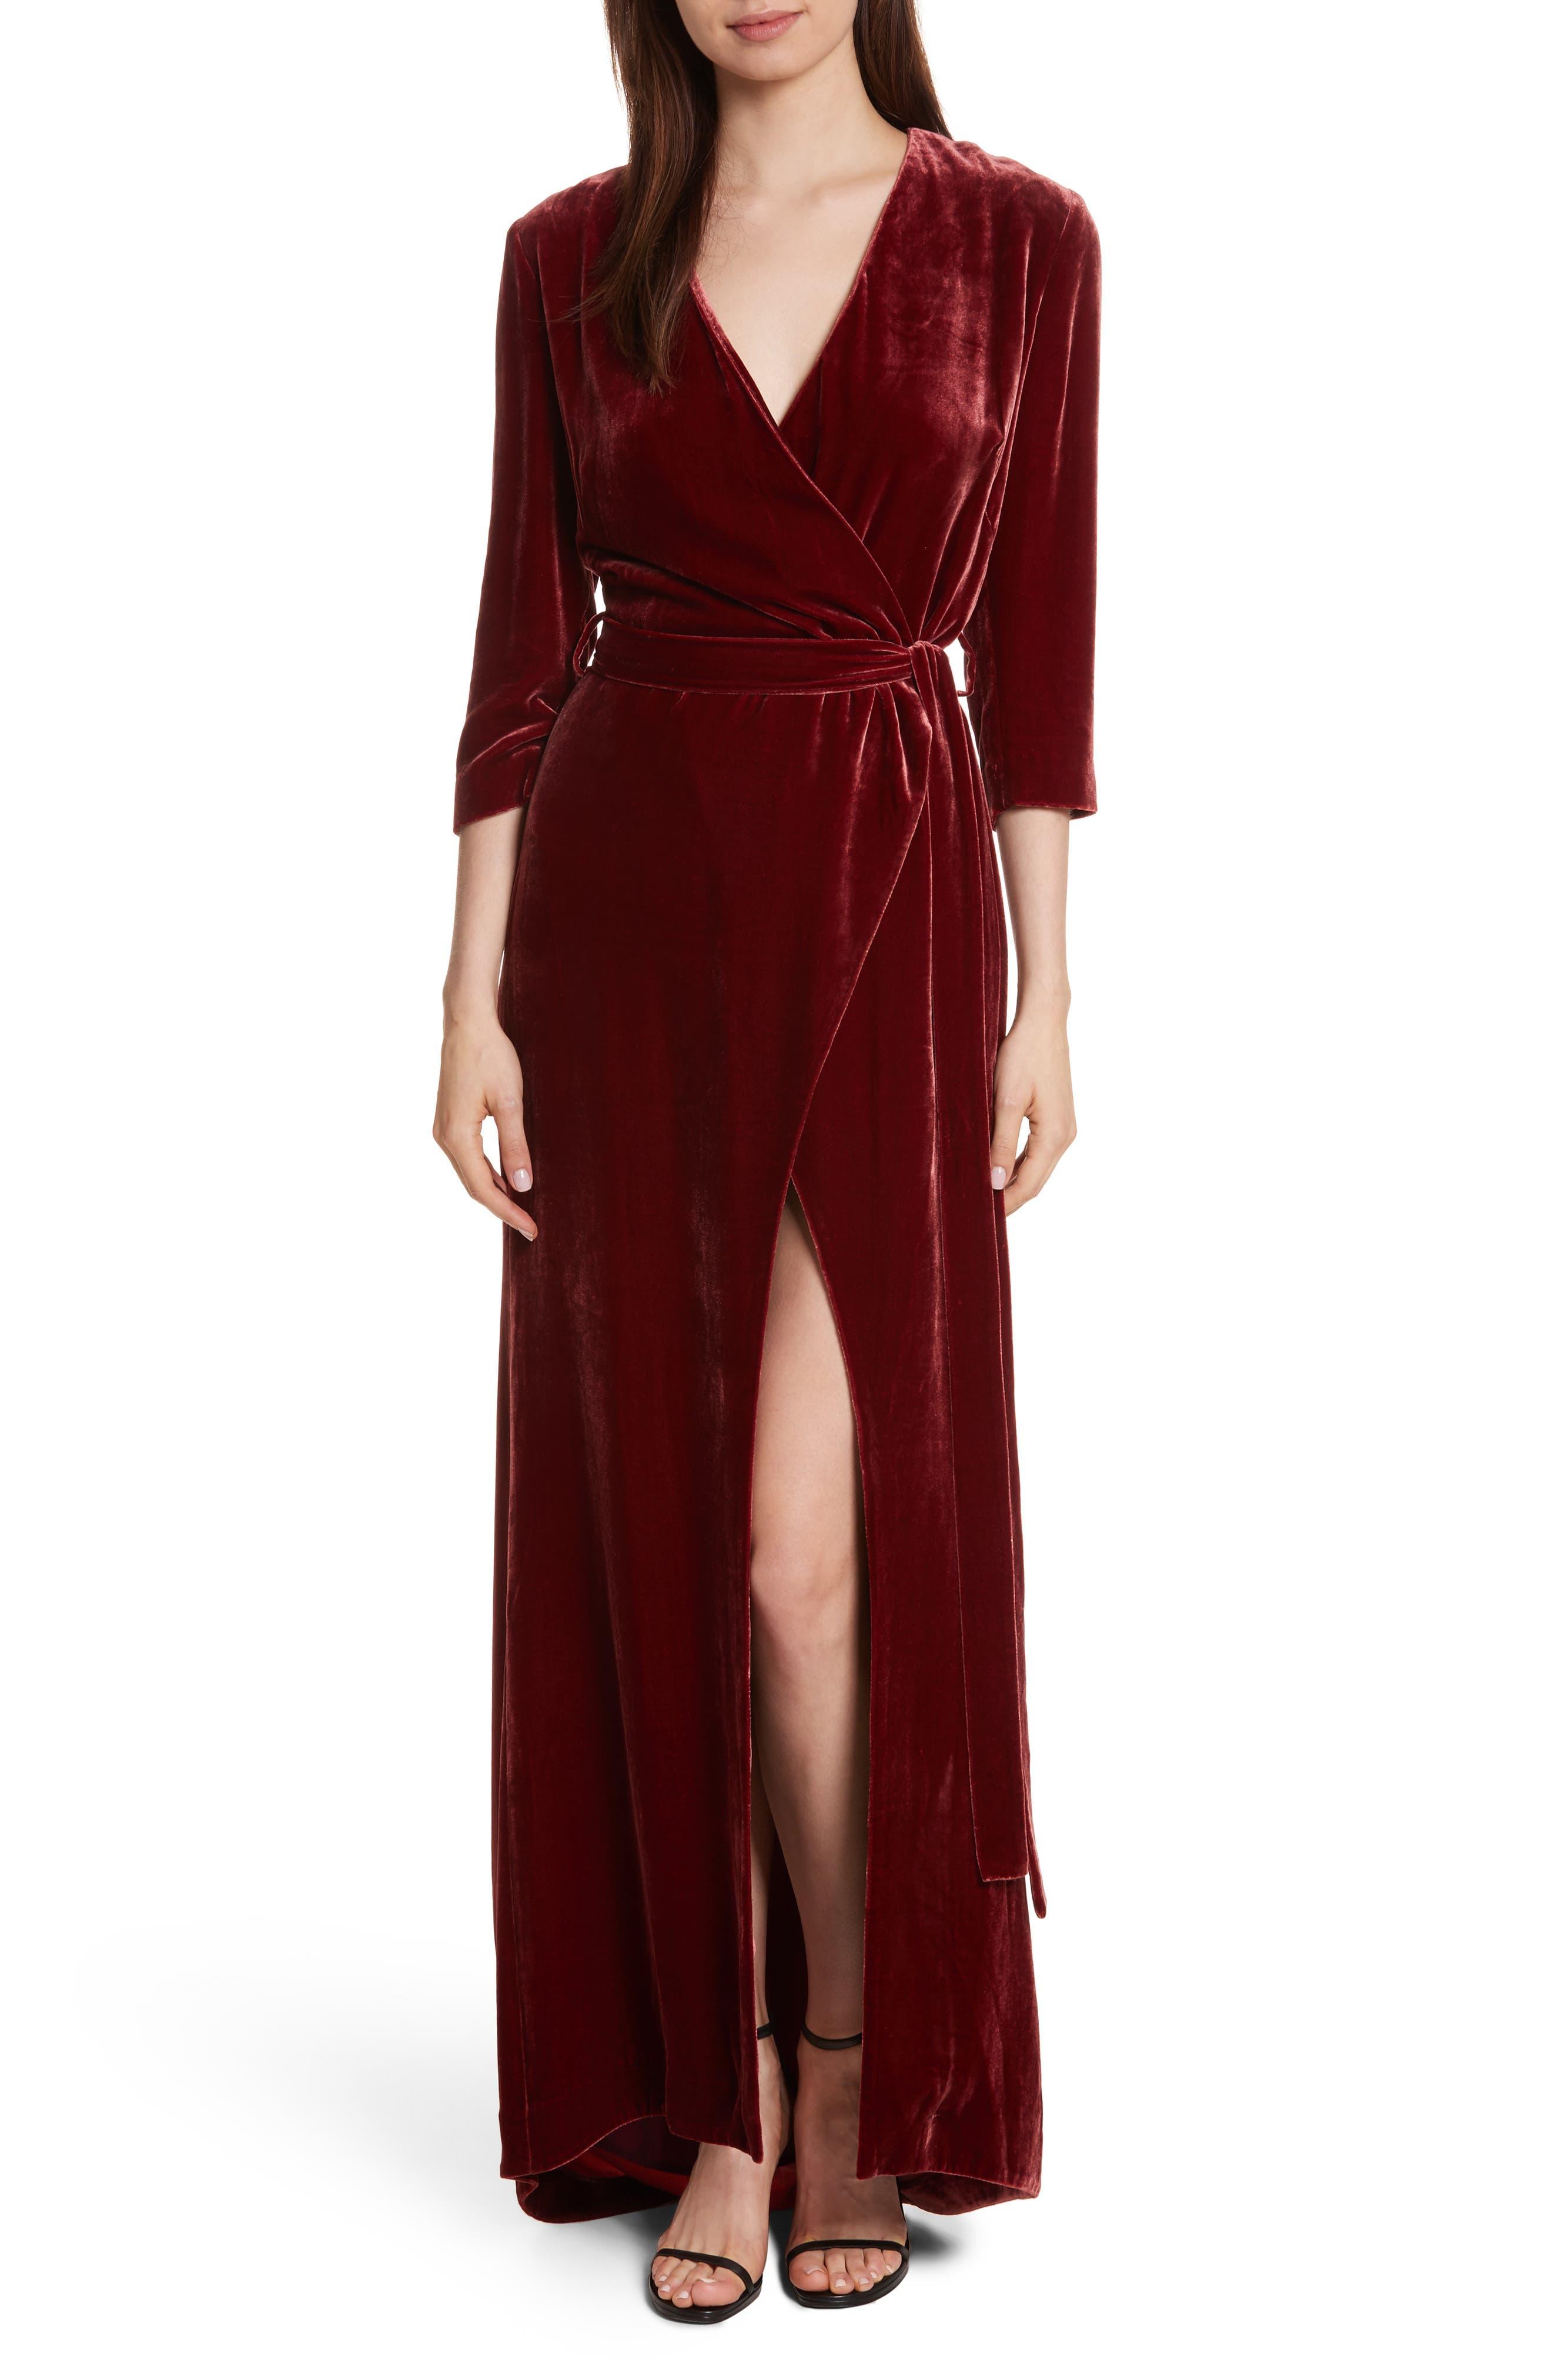 Rosalind Velvet Maxi Wrap Dress,                             Main thumbnail 1, color,                             600